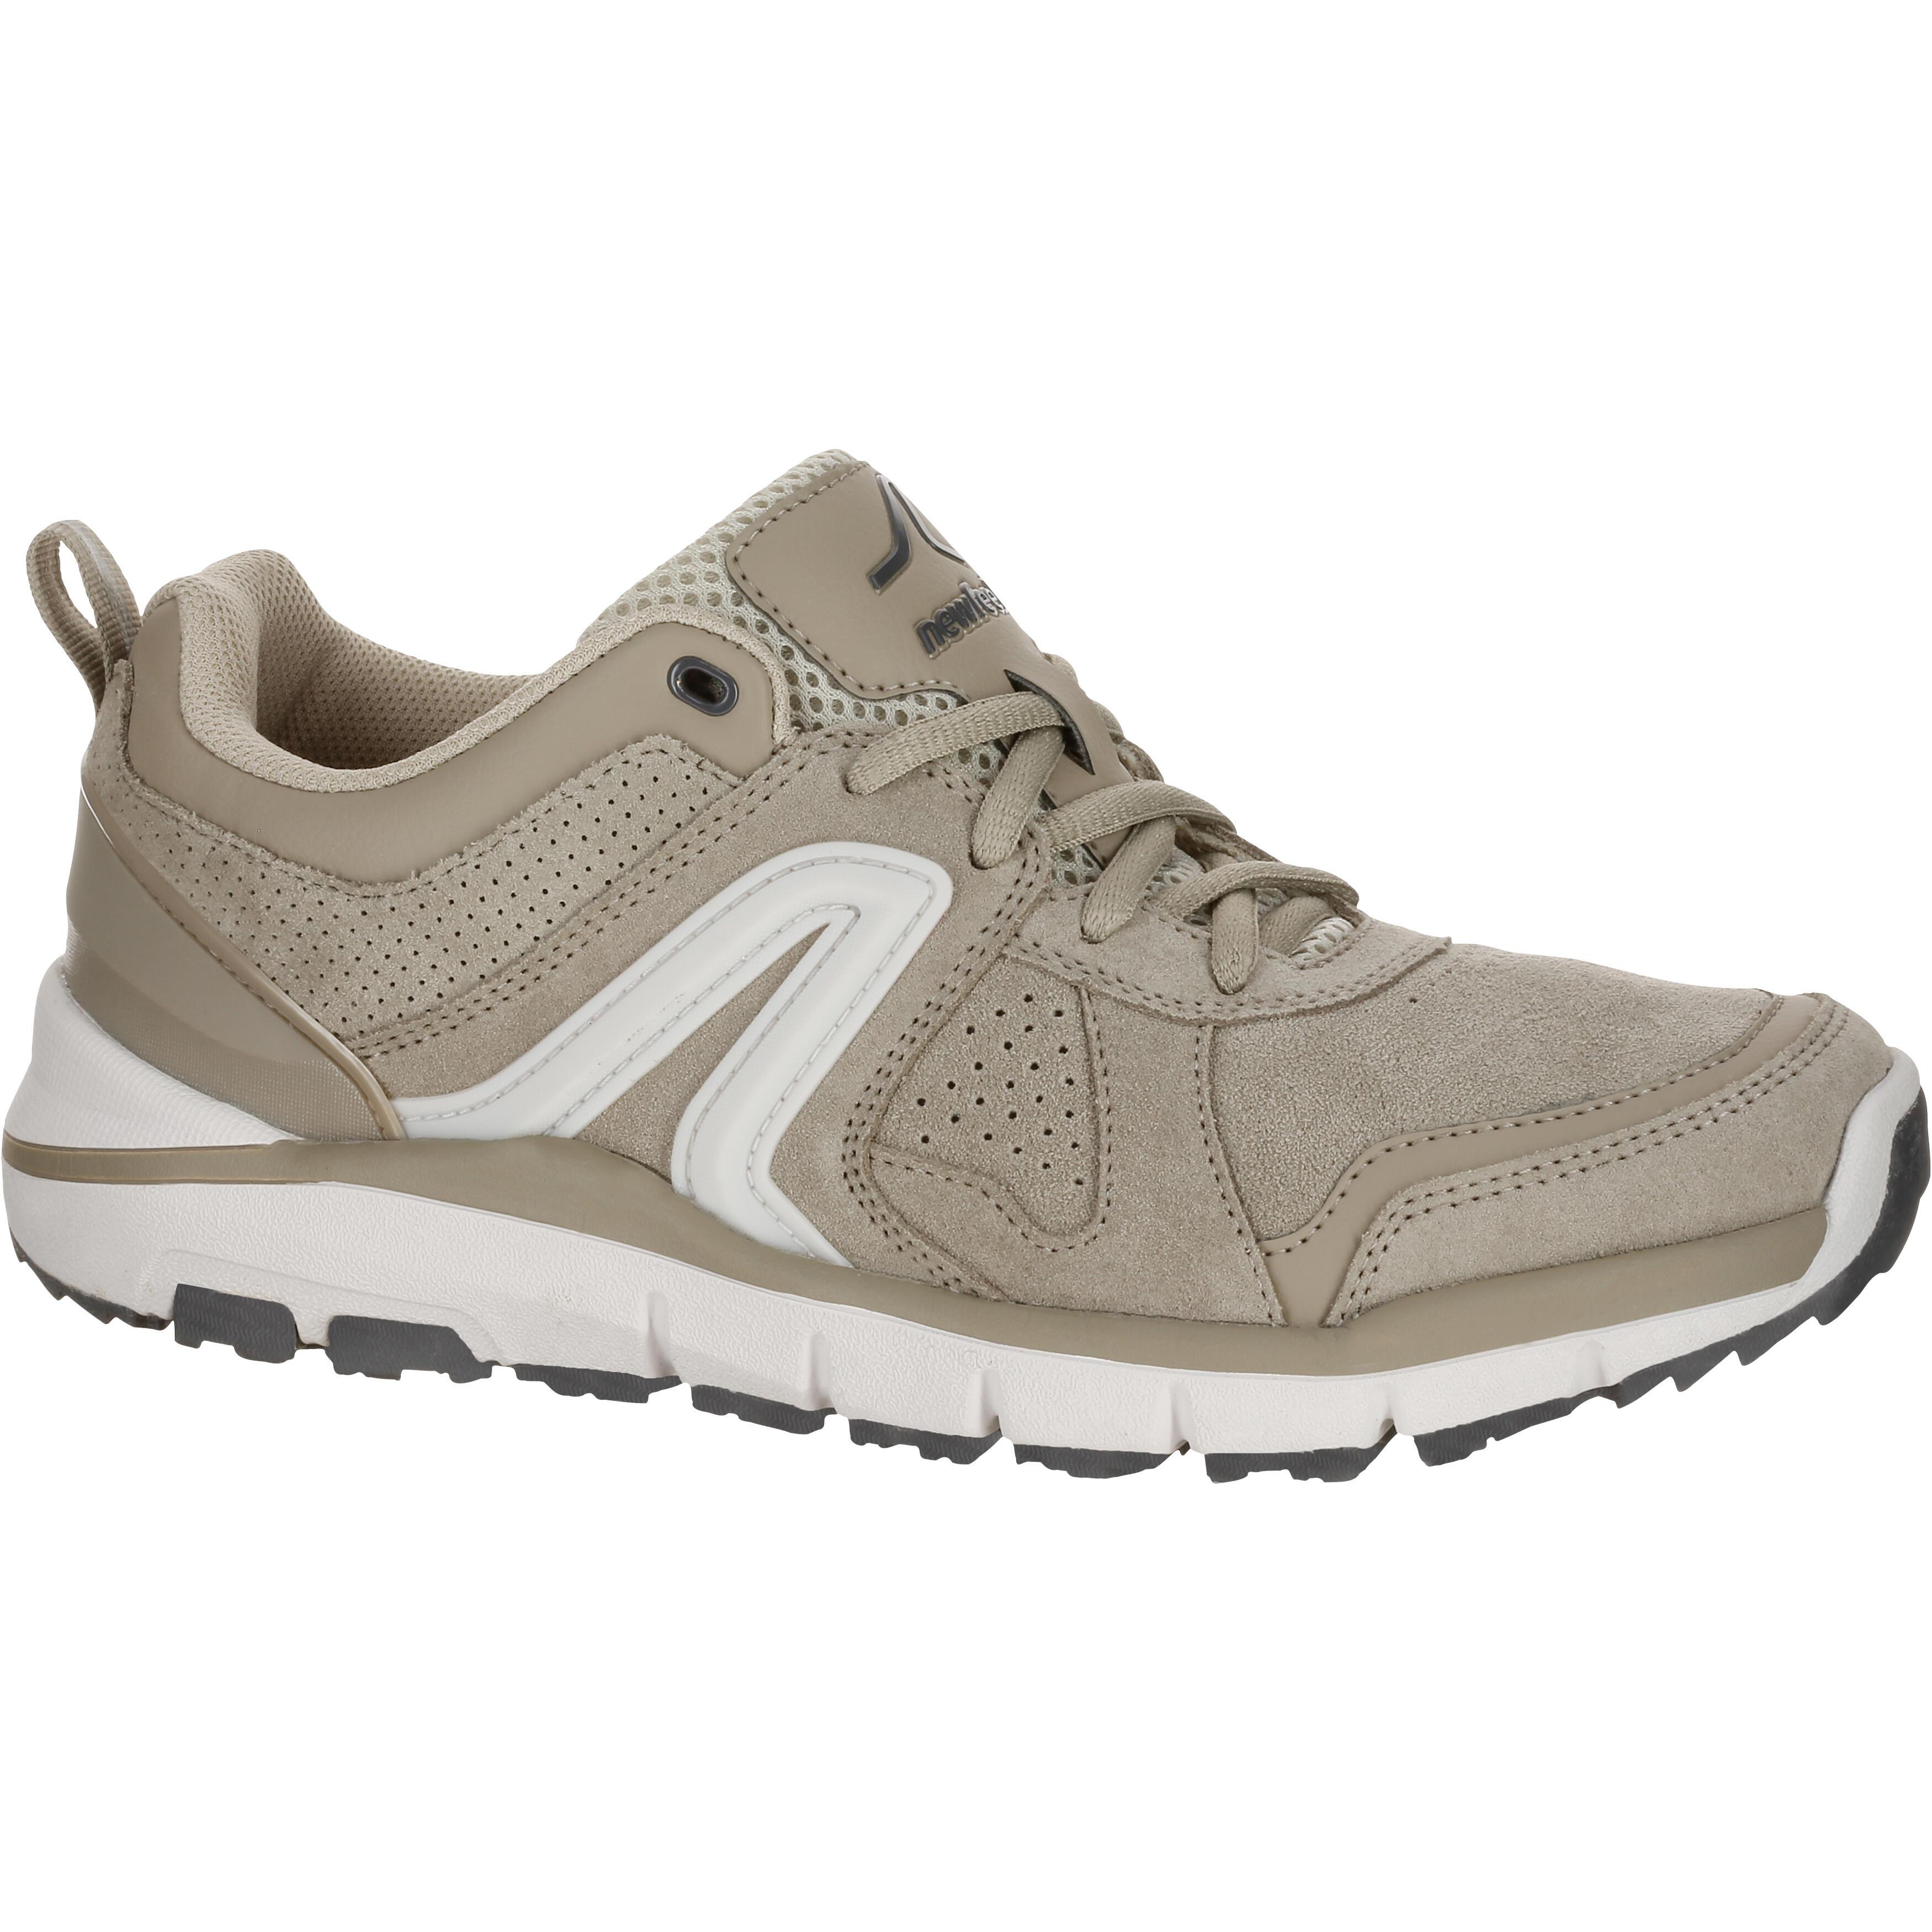 Walkingschuhe HW 540 Leder Damen beige | Schuhe > Sportschuhe > Walkingschuhe | Beige | Leder | Newfeel